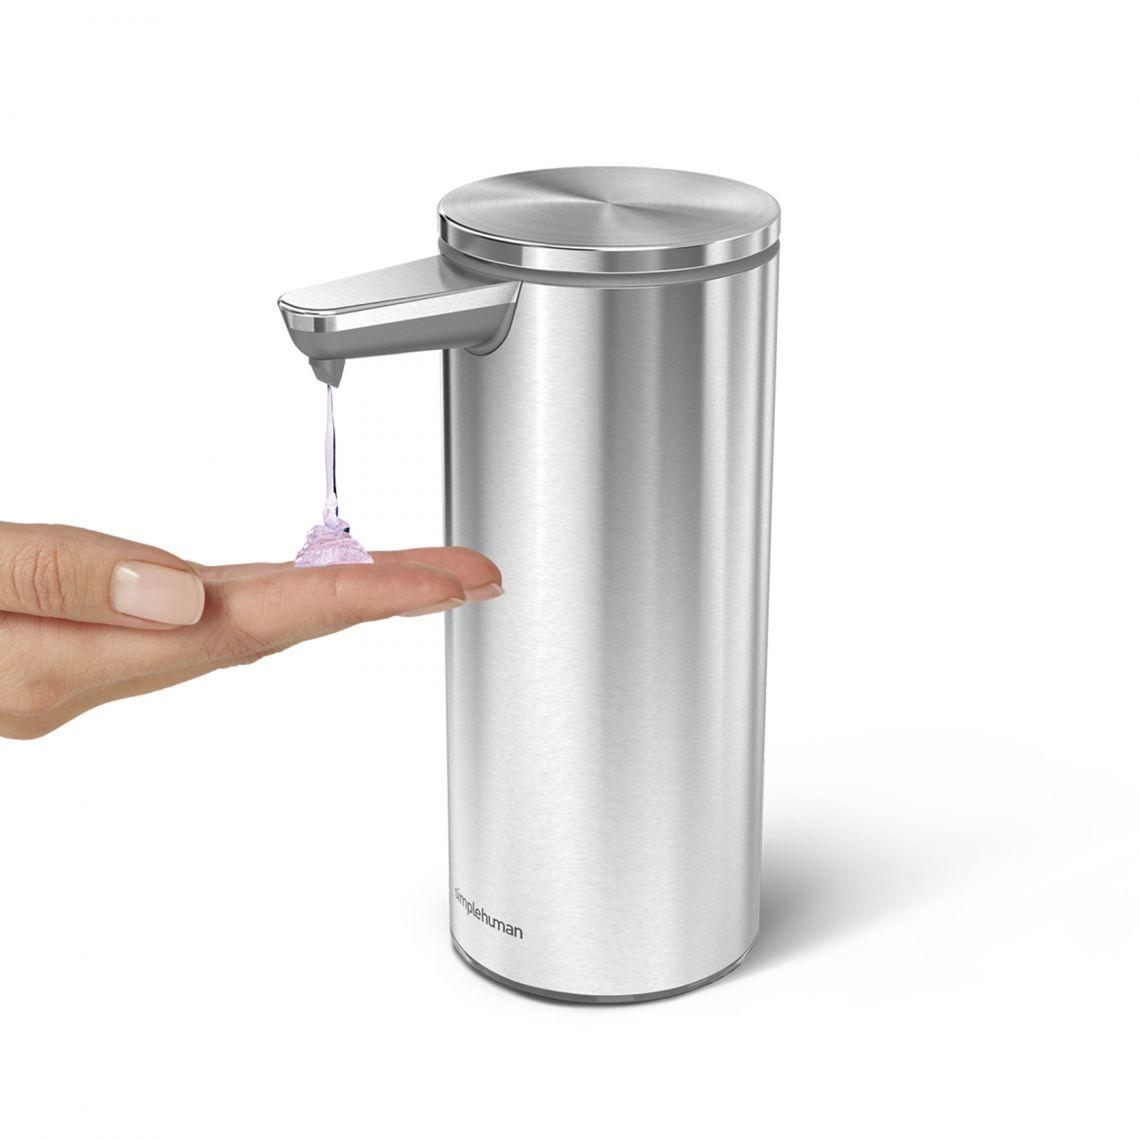 Bezdotykový dávkovač mýdla Simplehuman – 266 ml, kartáčovaná ocel, dobíjecí